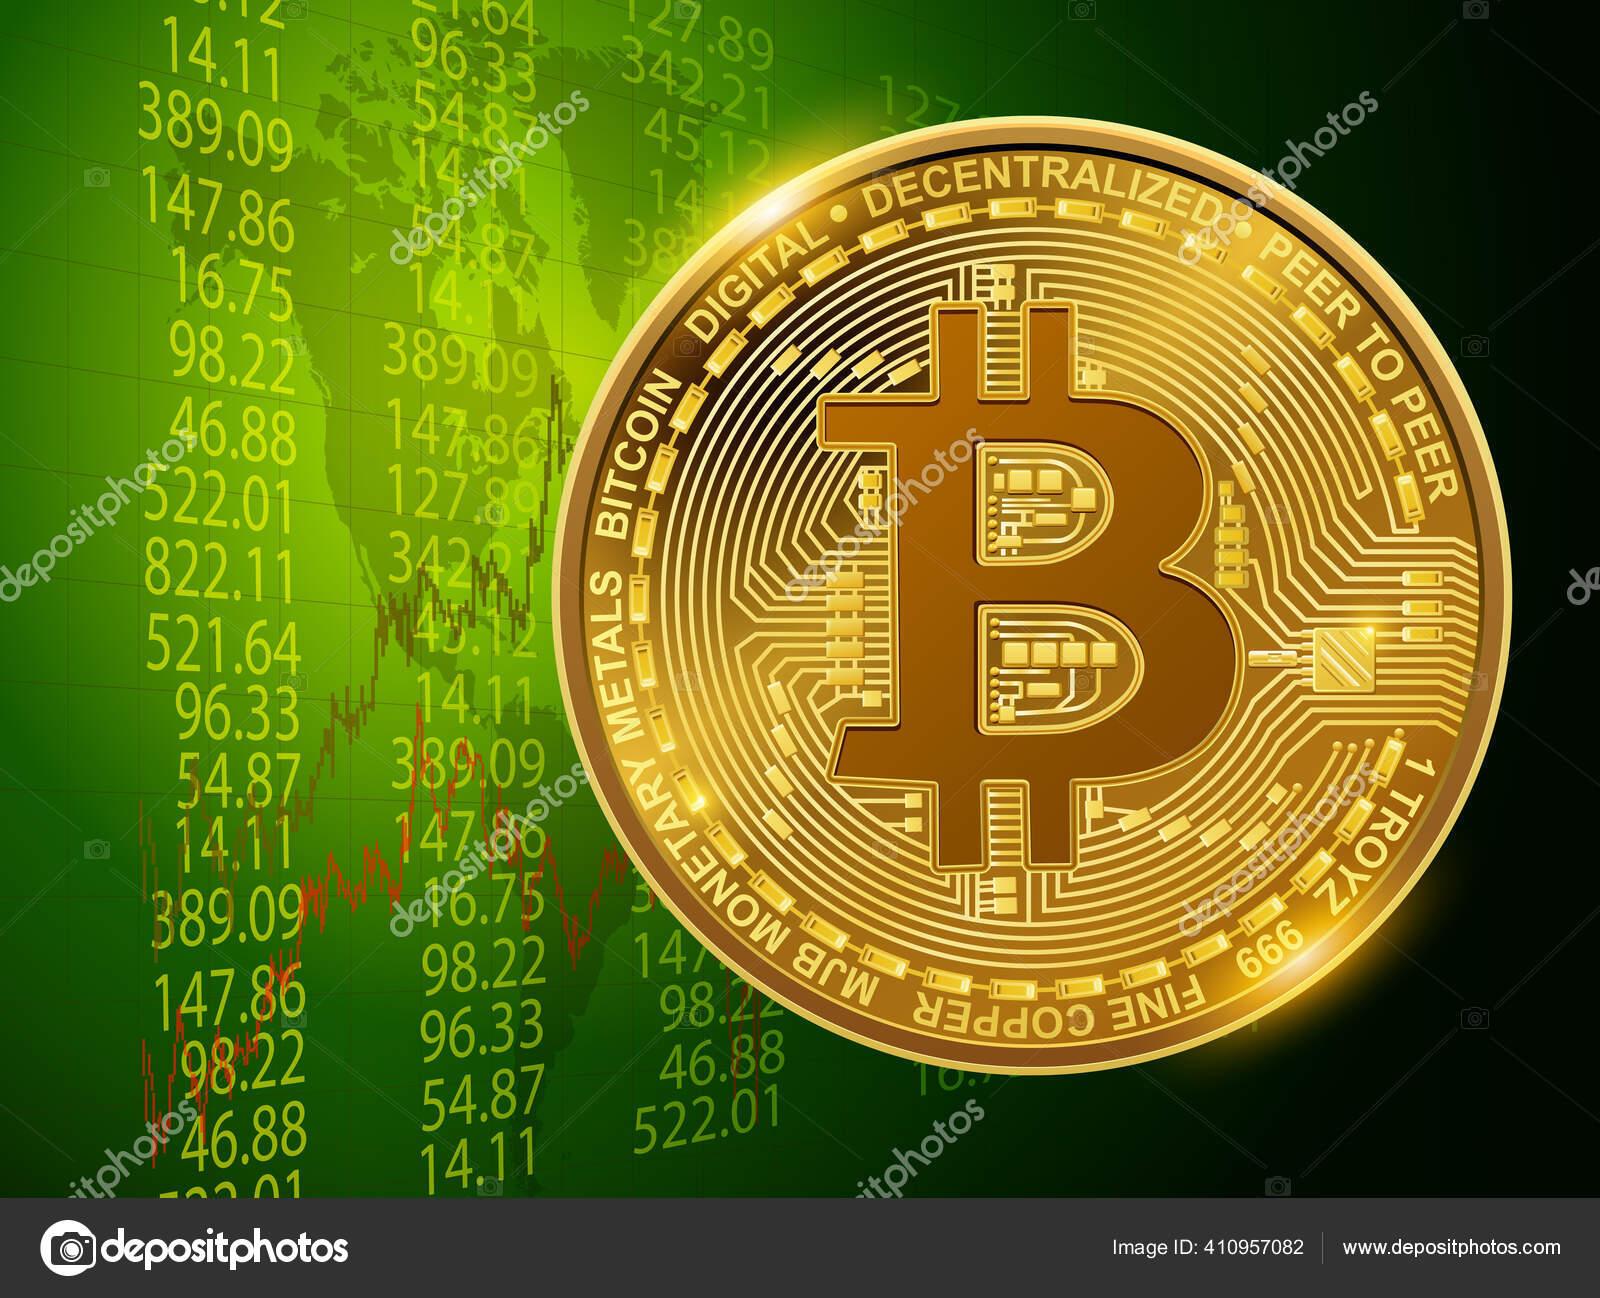 Apa itu Bitcoin? Simak Penjelasan Lengkap Mengenai Bitcoin!